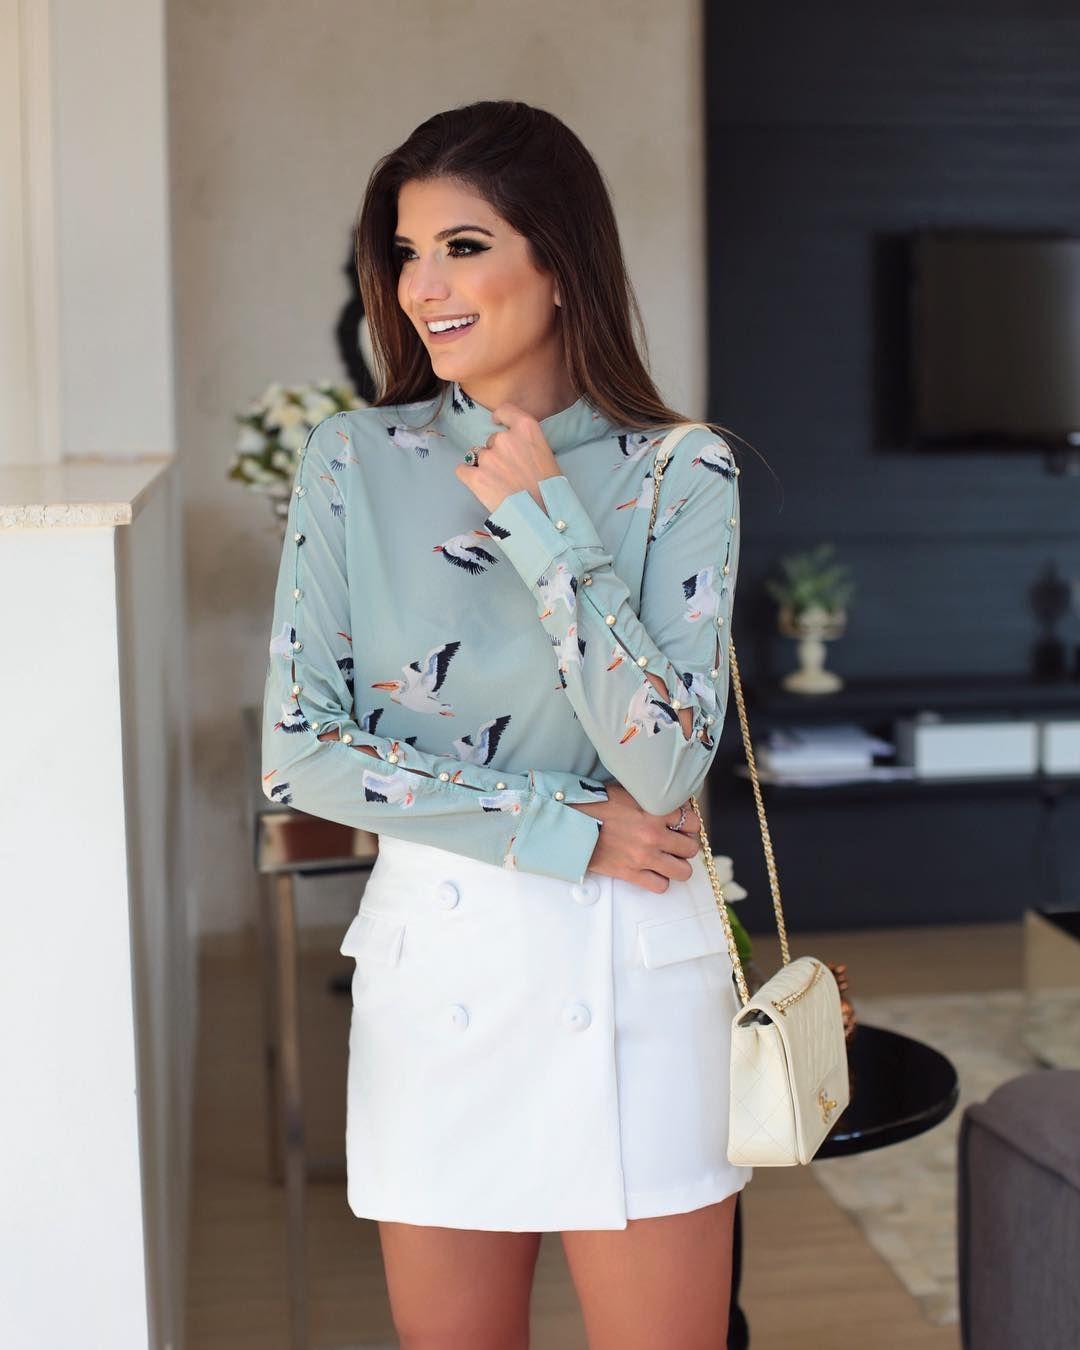 Look  murauoficial ♥ Camisa estampada com pérolas na manga com short saia  branco!  newcollection  blogtrendalert 7f09606c552b0